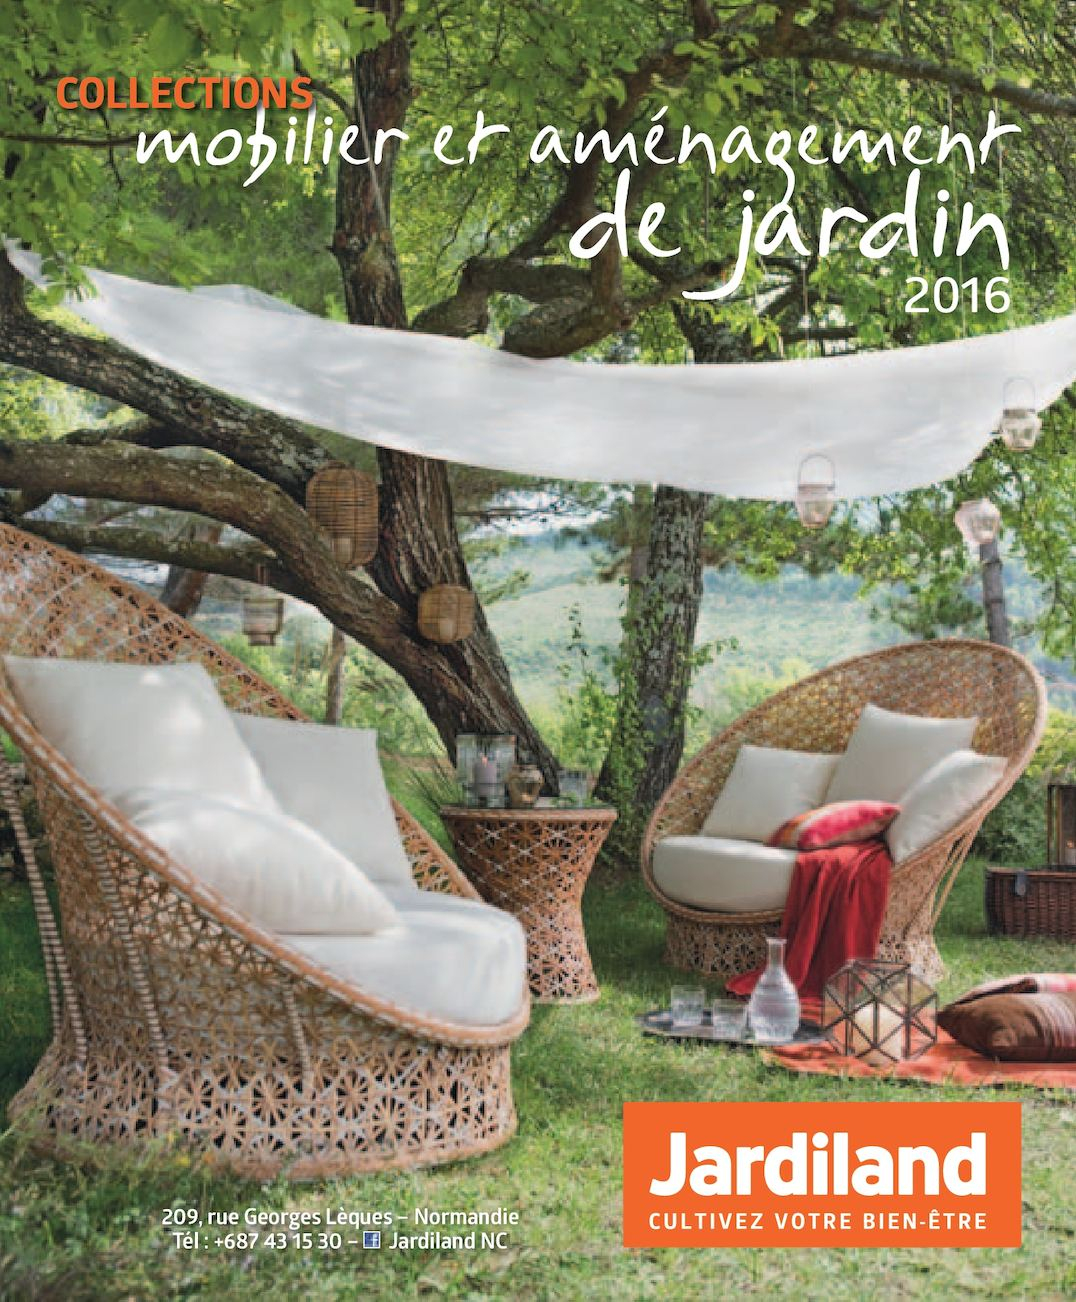 Calaméo - Catalogue Été 2016 Jardiland Nouvelle-Calédonie à Bassin De Jardin Jardiland